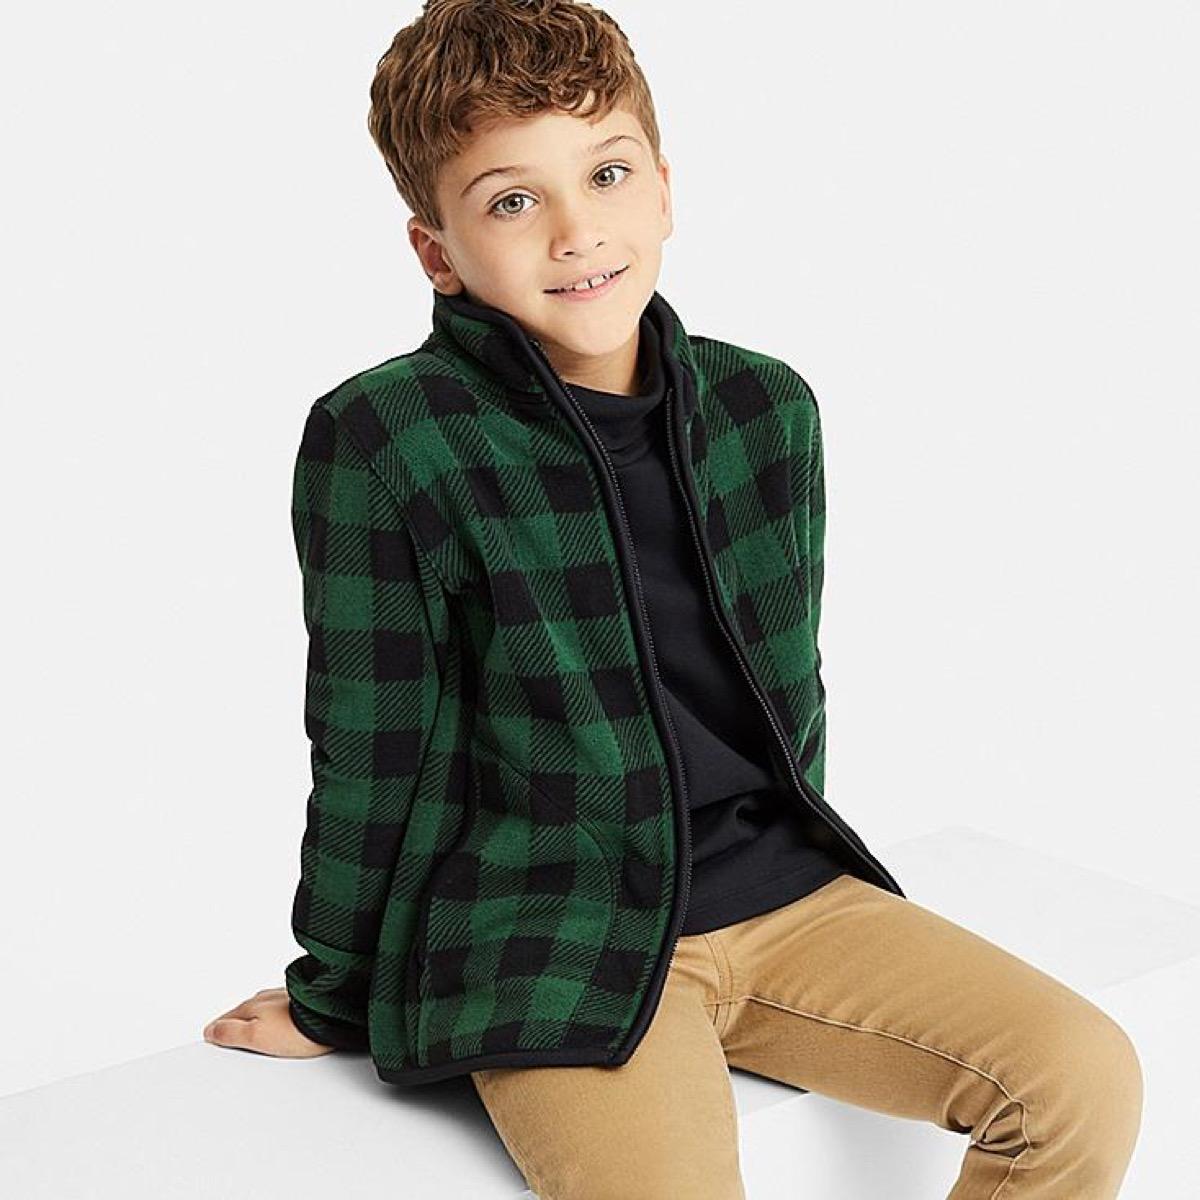 Uniqlo Printed Fleece {Save Money on Kids' Clothes}